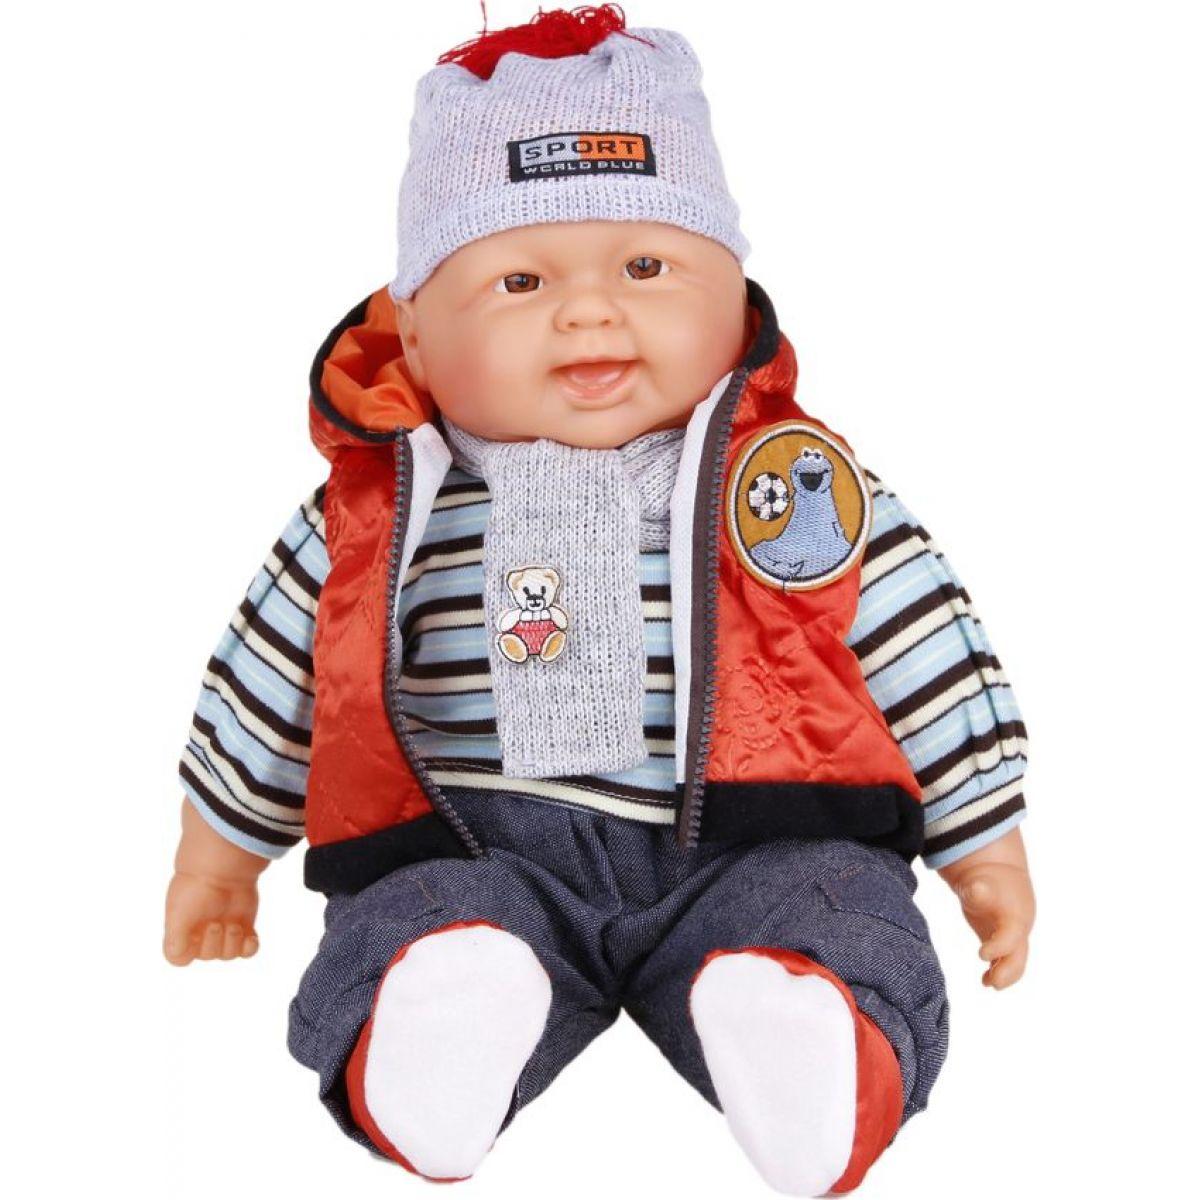 Bábätko veľké Chlapec oranžová vesta 55 cm